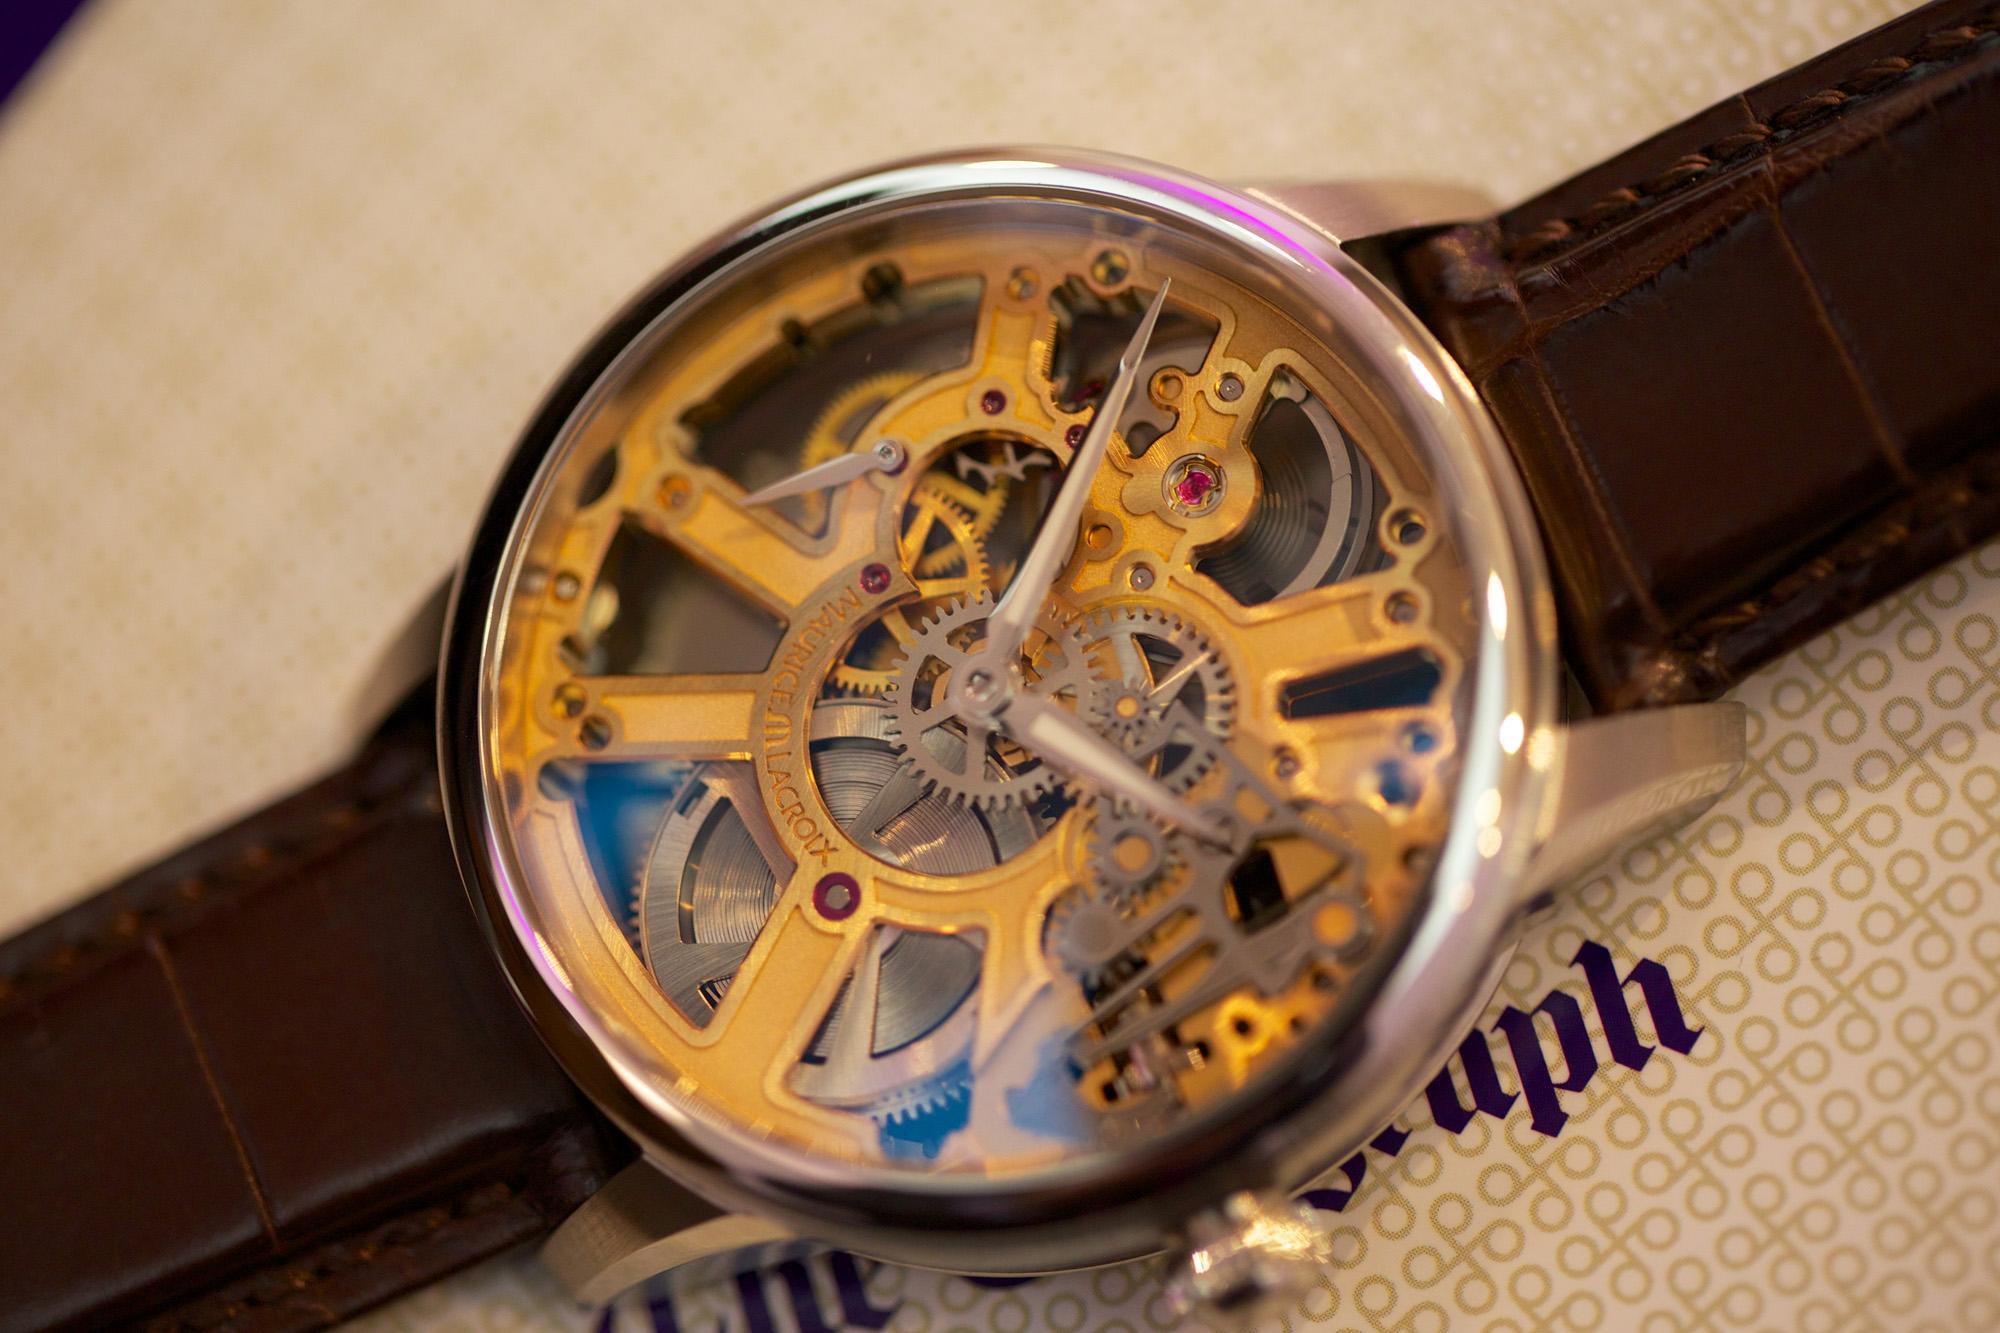 Maurice Lacroix Masterpiece Squelette - Watch